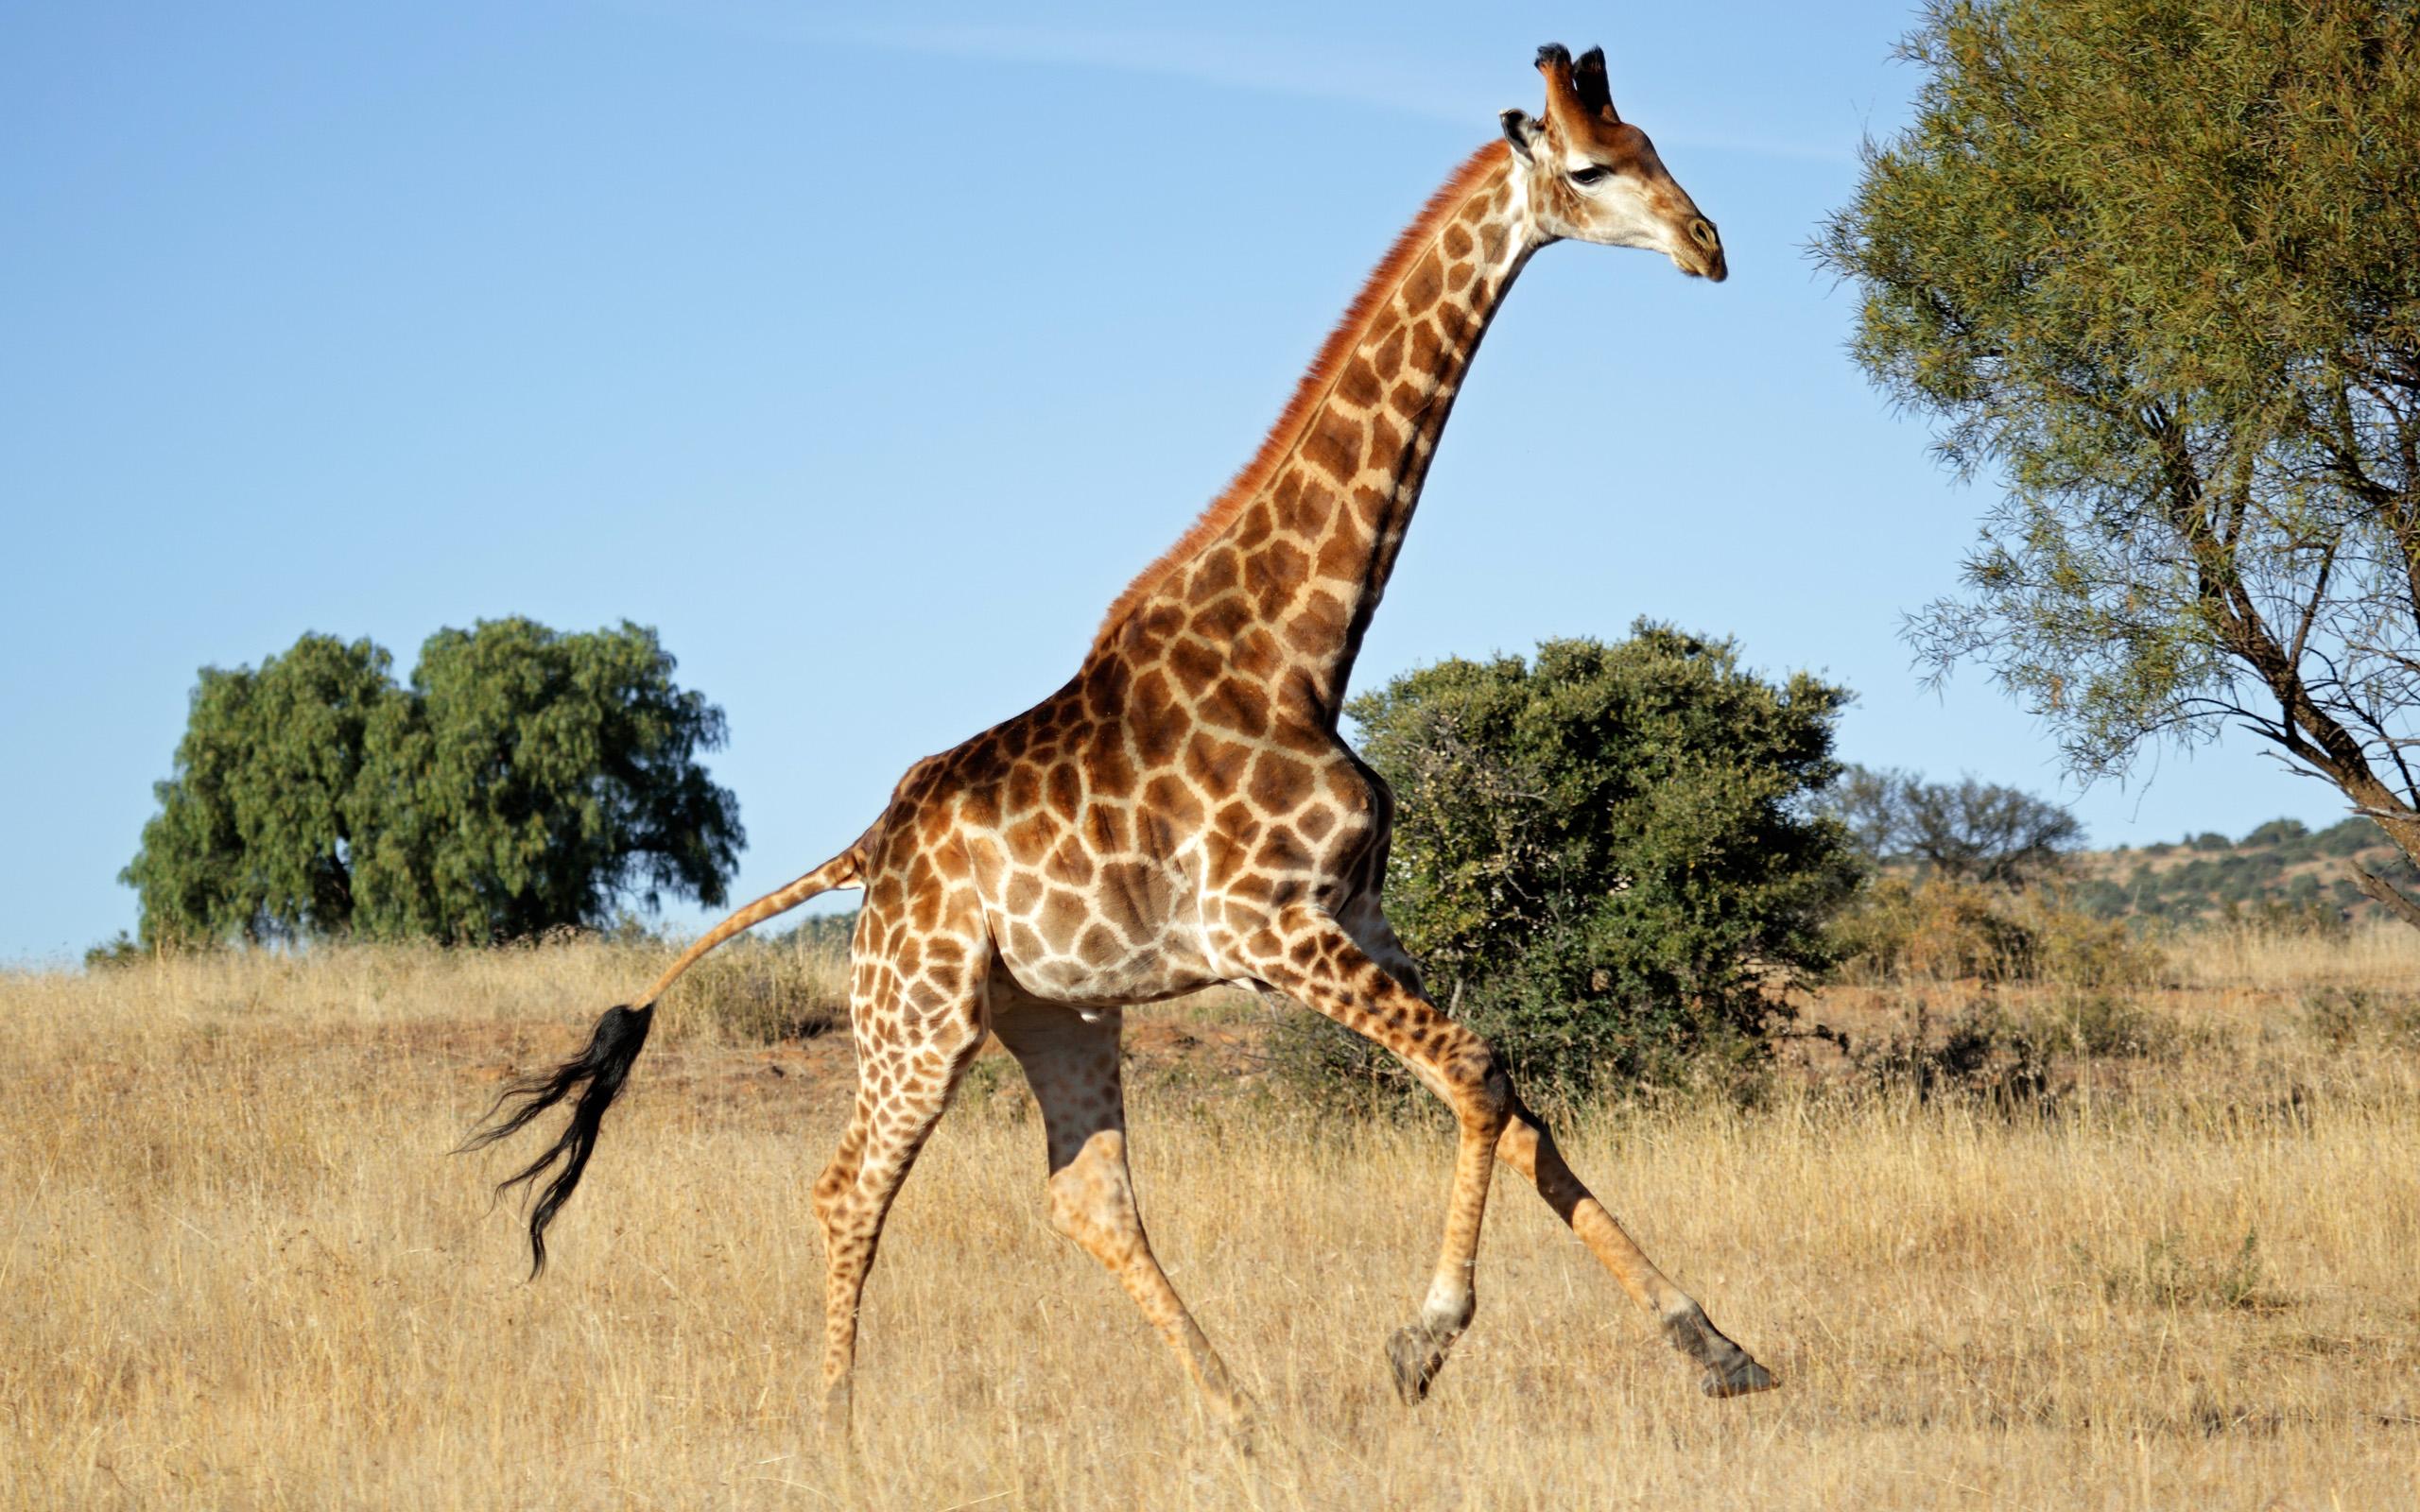 Giraffe (Giraffa camelopardalis) running on the African plains, South Africa